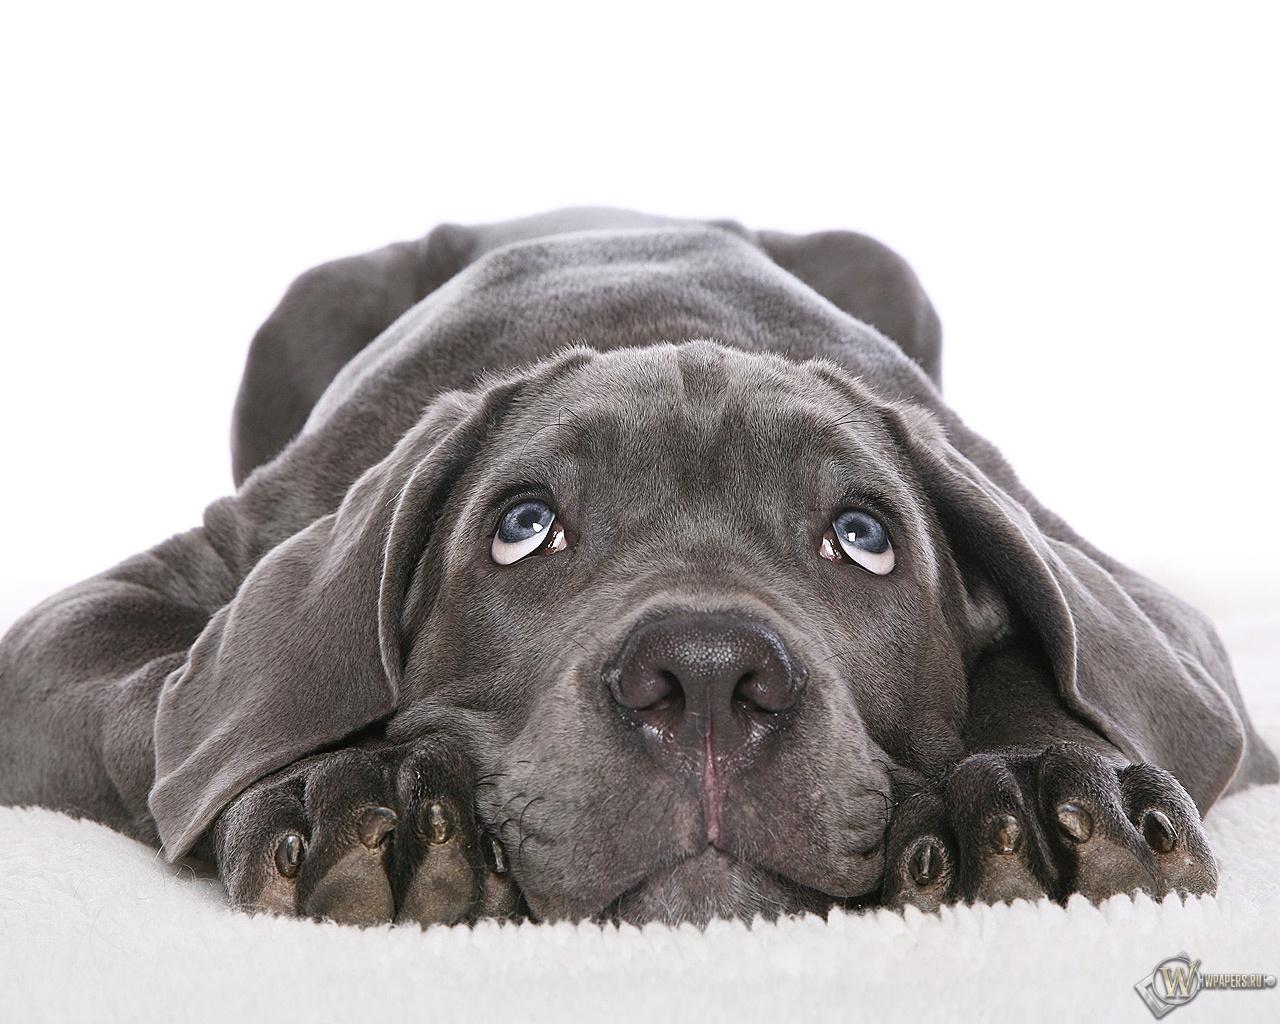 Собака в печали 1280x1024